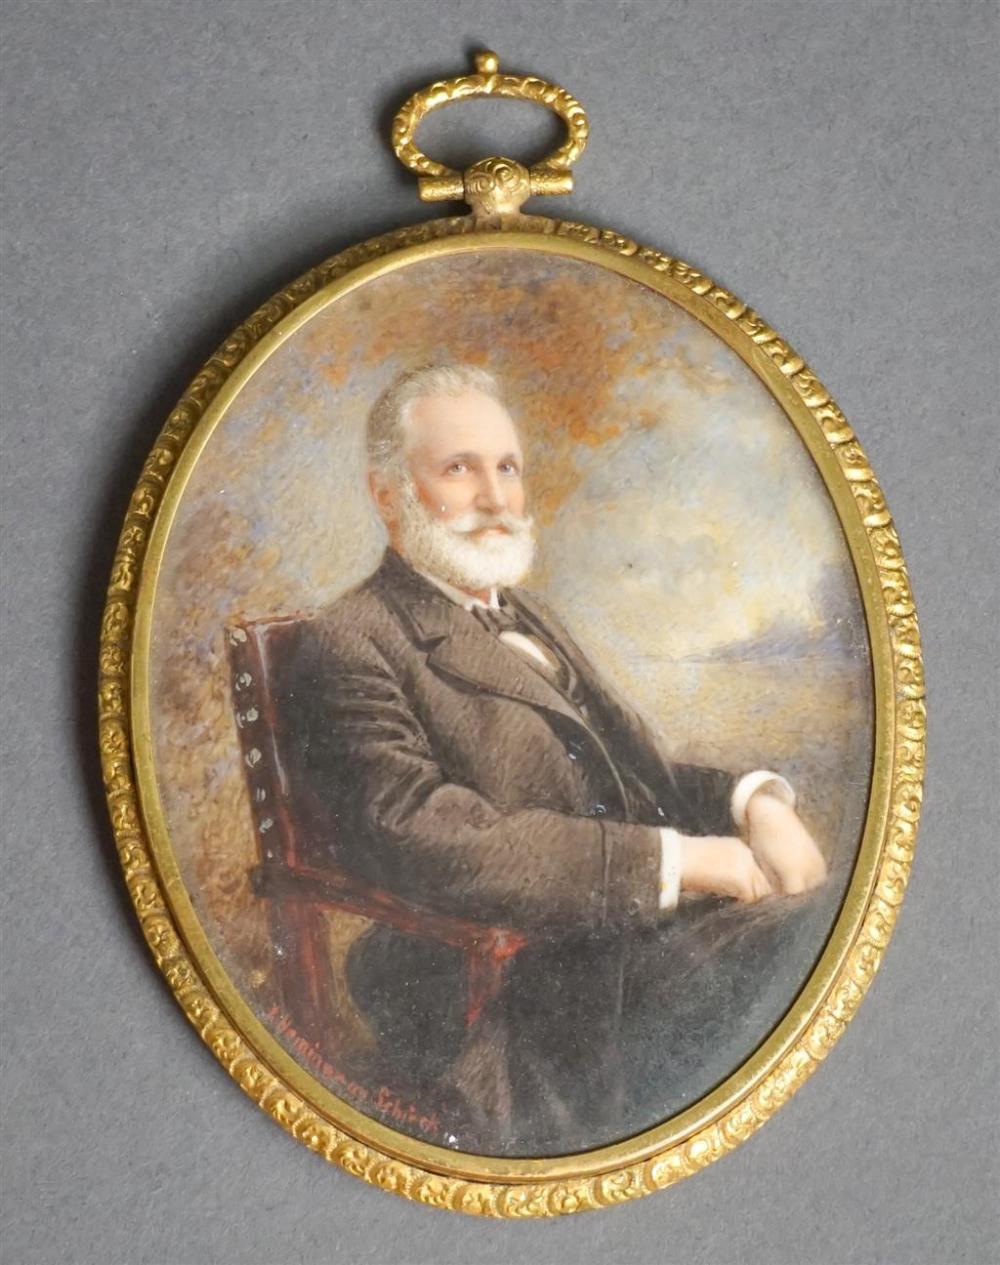 Miniature Watercolor Portrait of Charles W. Norris